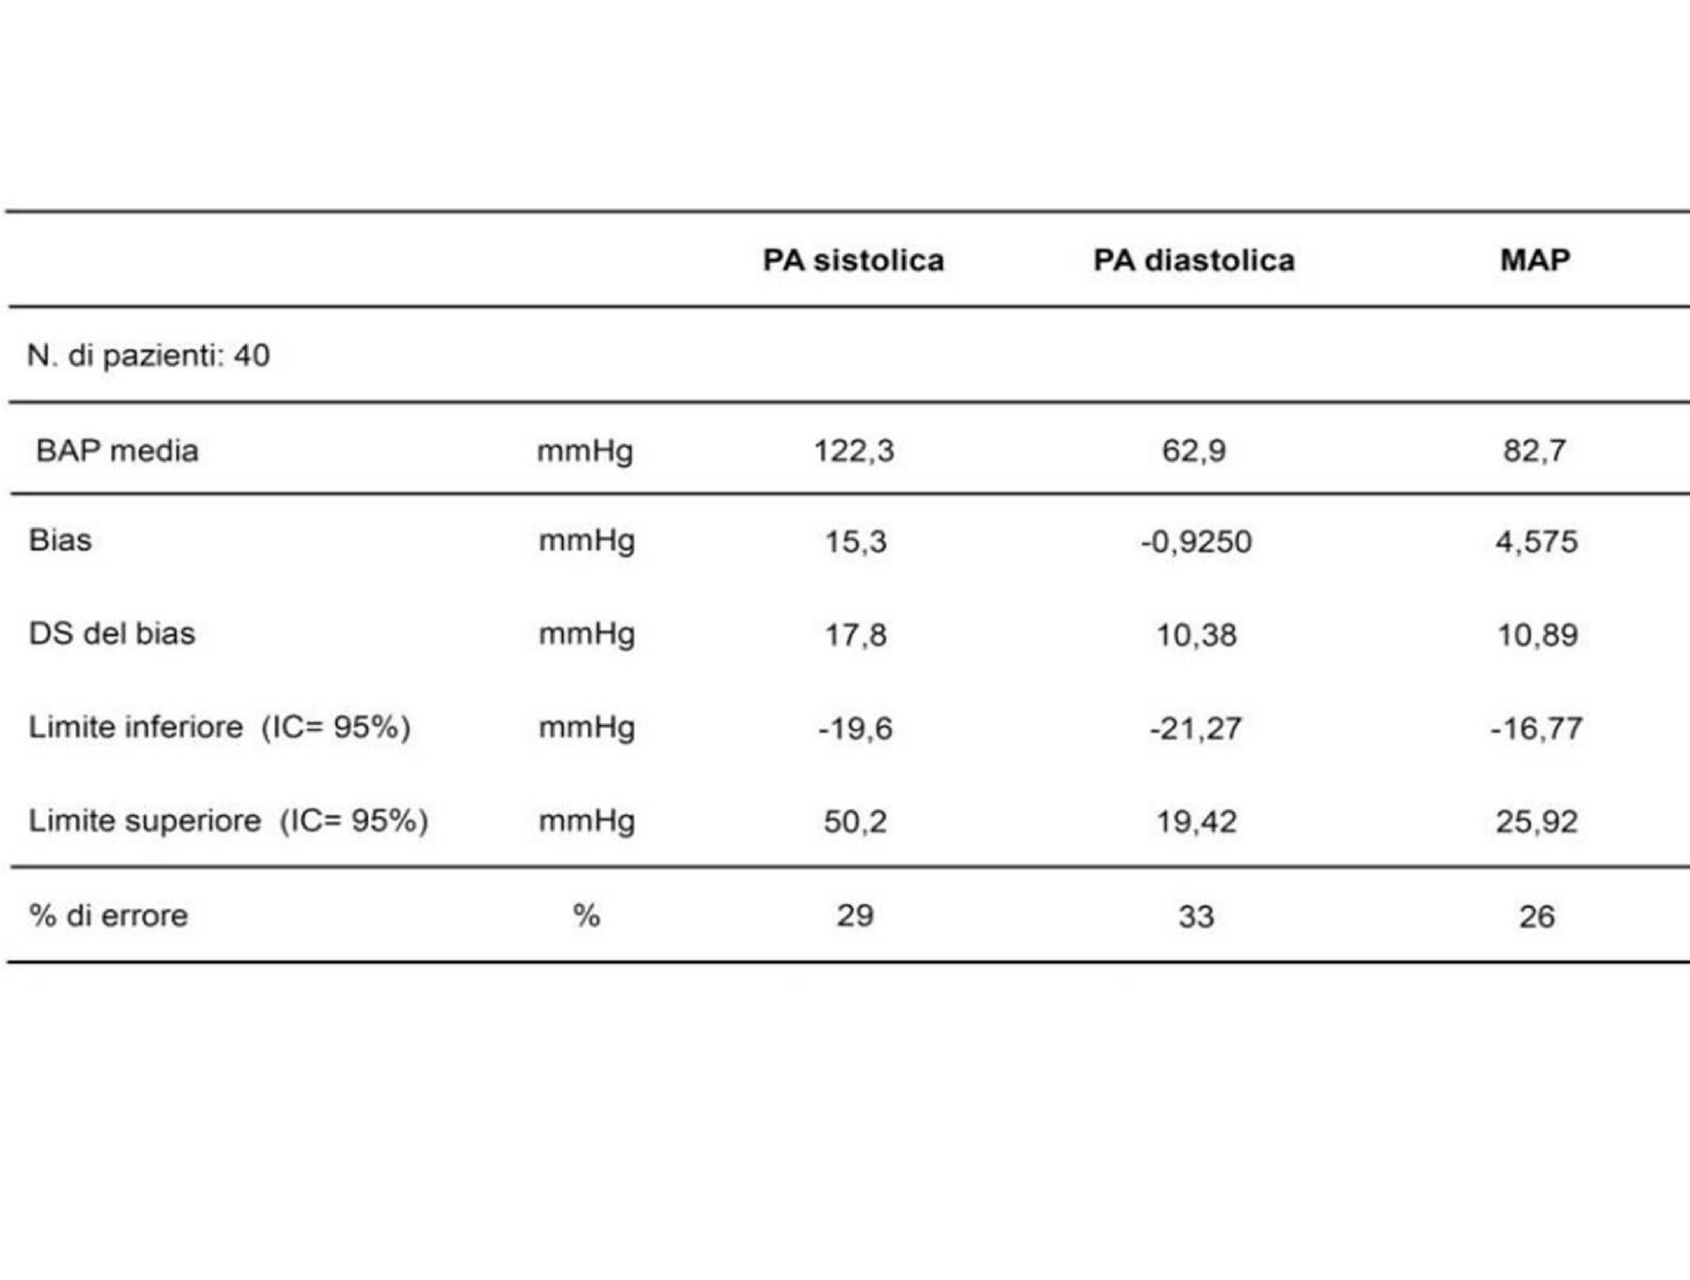 Схема лечение тяжелой гипертонии - Ipertensione passo 3 di grado 3 10 mb